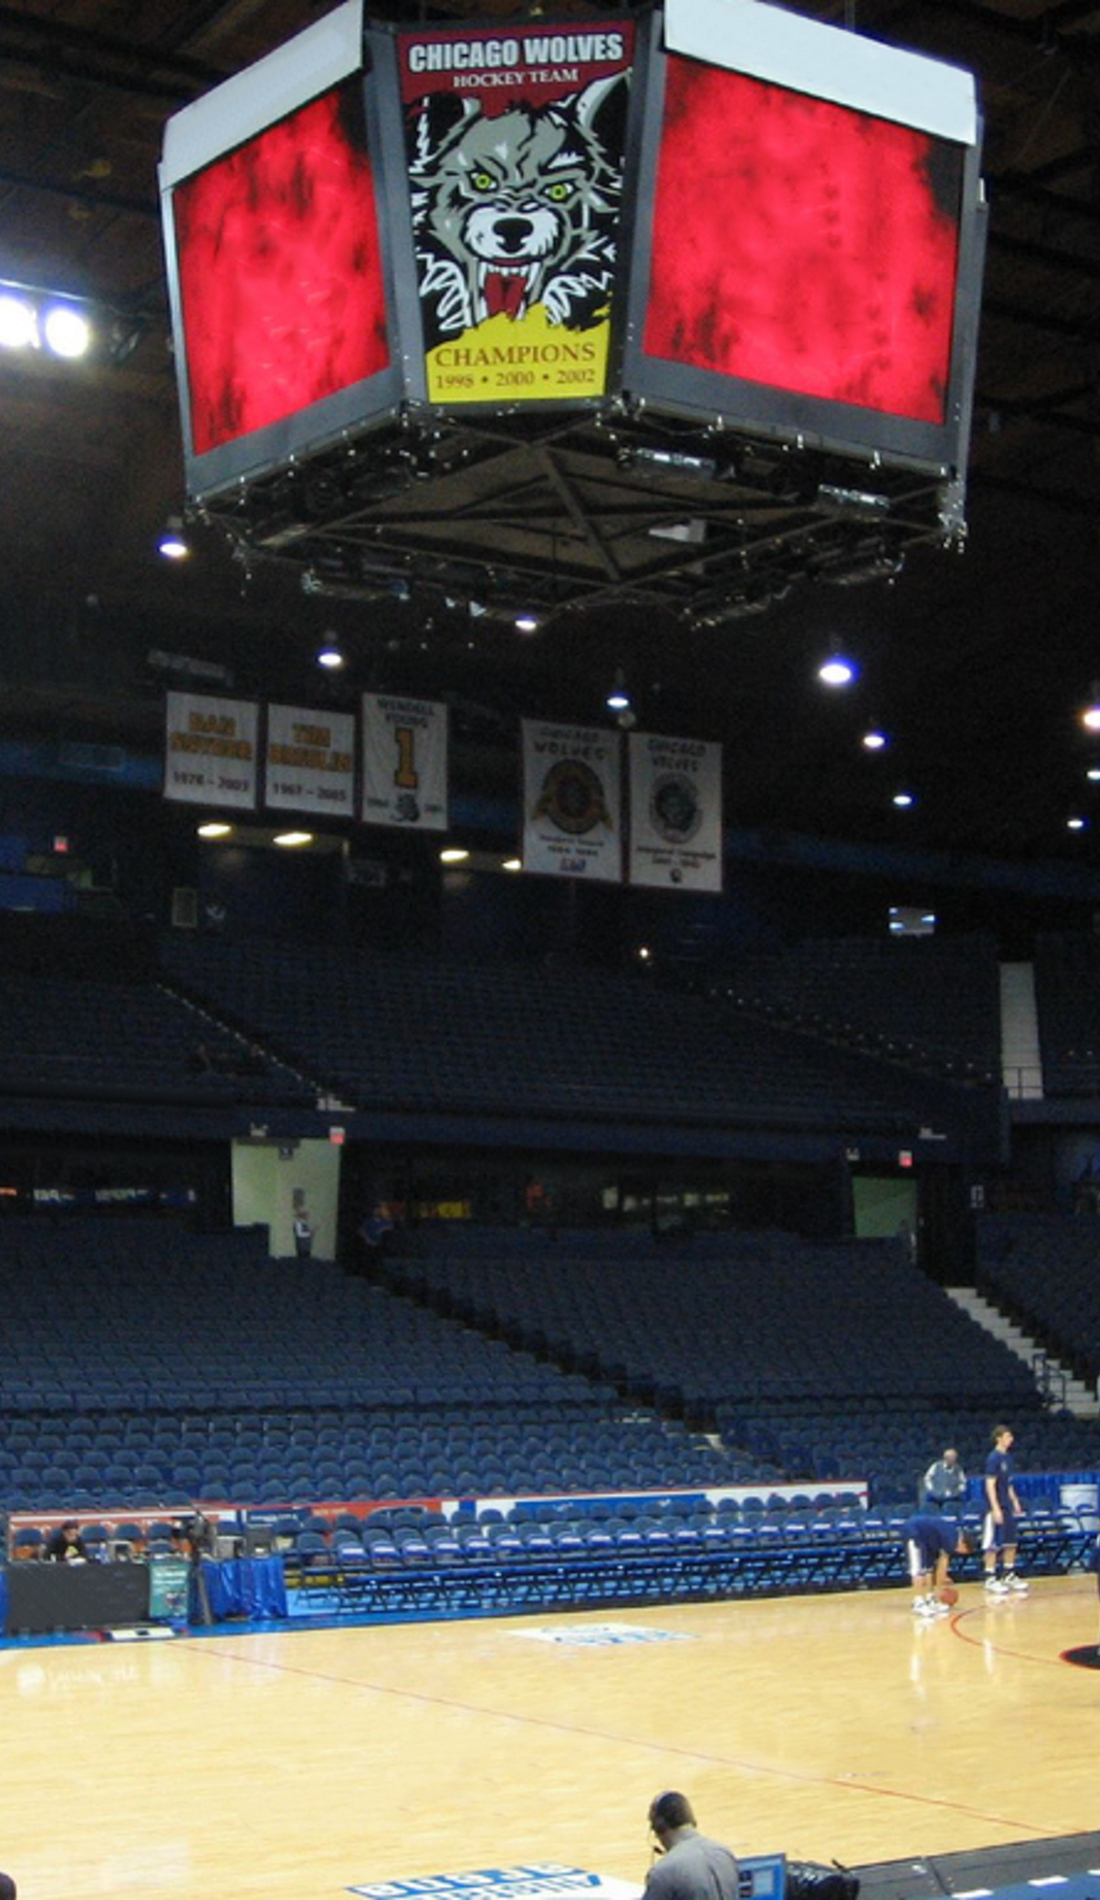 A DePaul Blue Demons Basketball live event